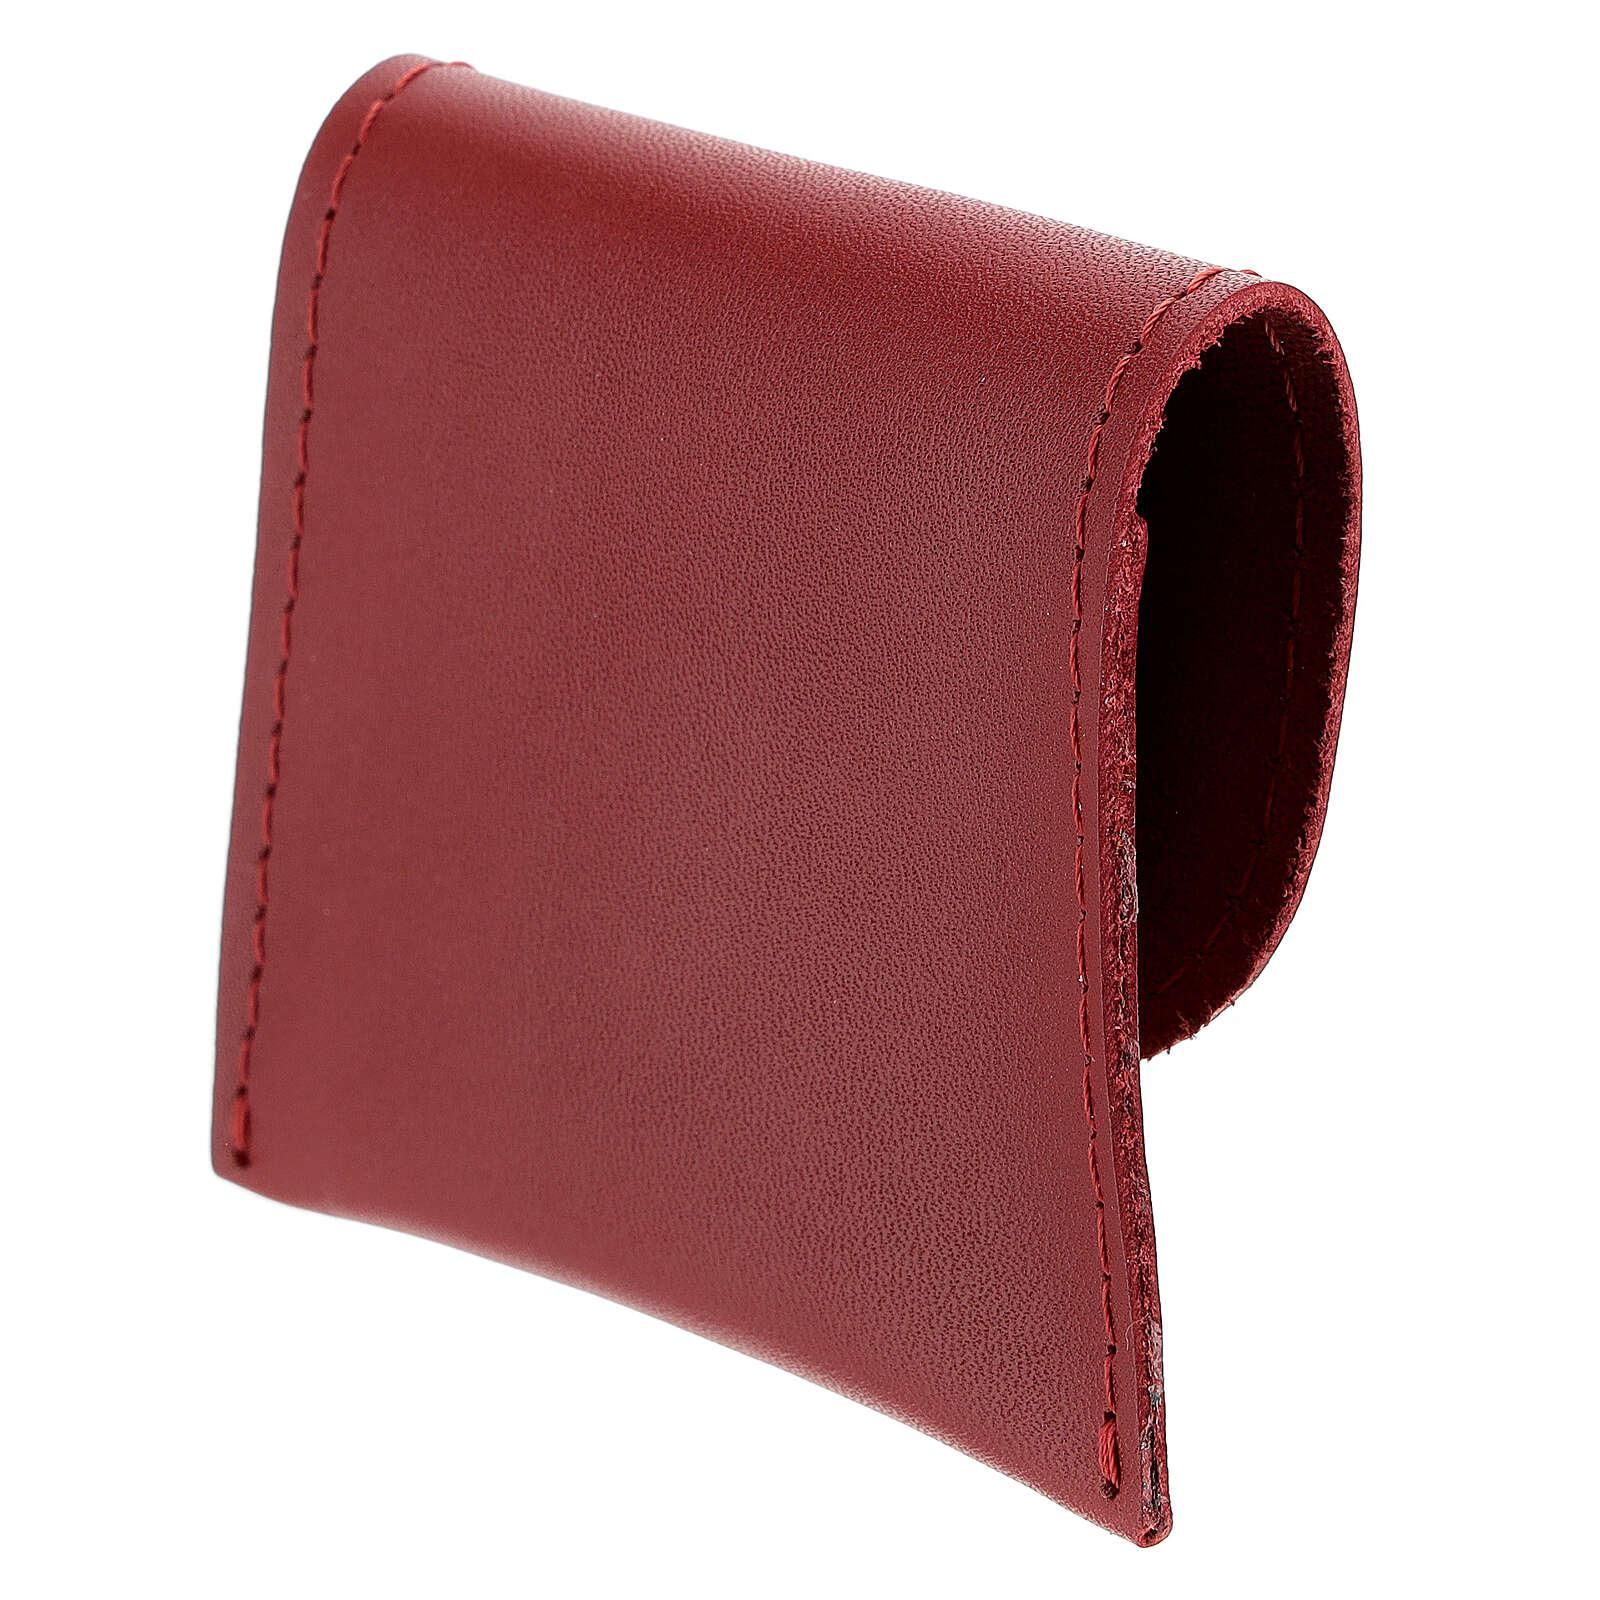 Astuccino portarosario pelle rossa croce 7x8 cm 4